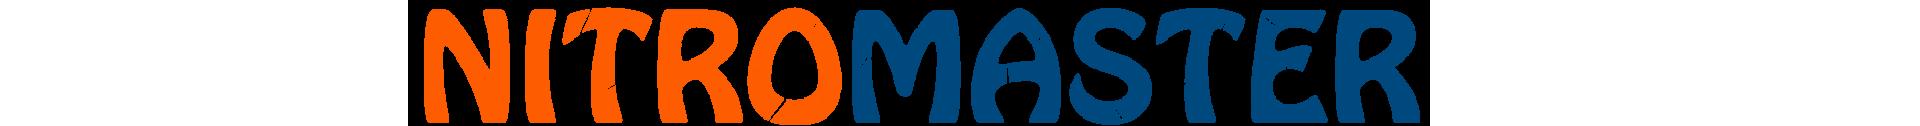 NITROMASTER Logo